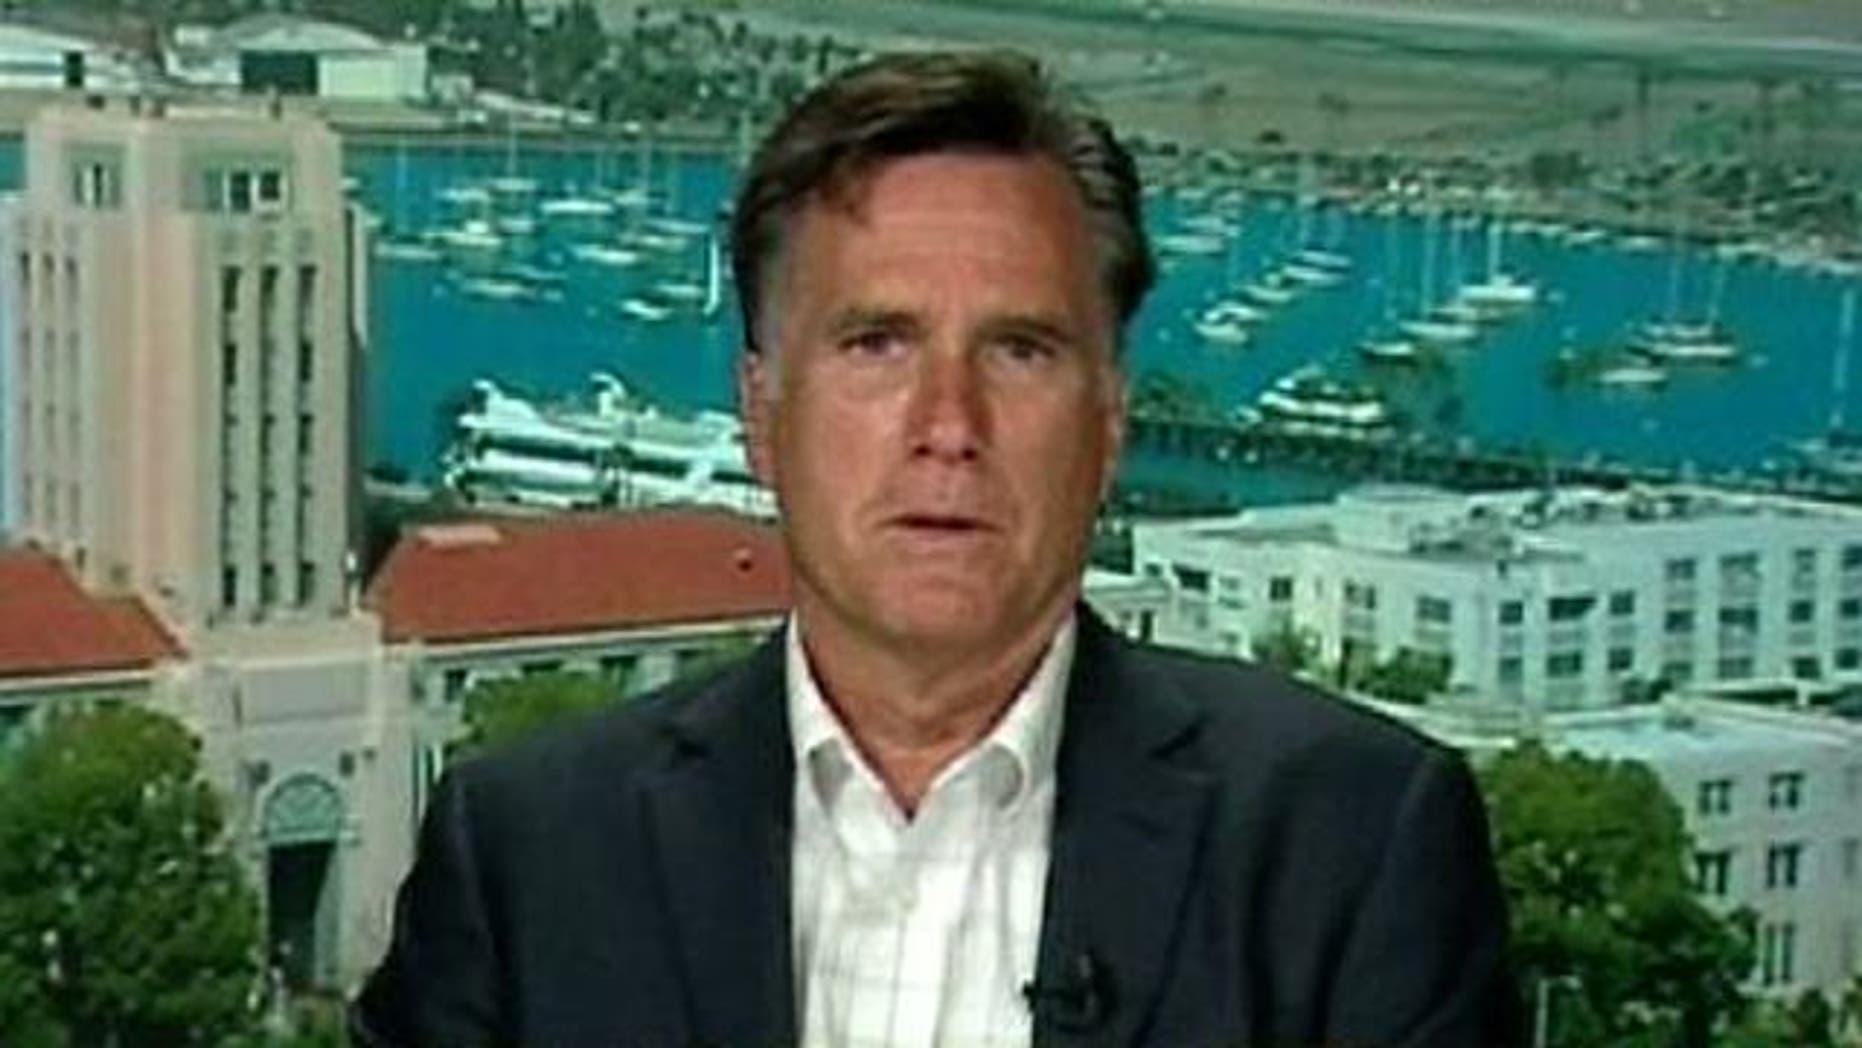 GOP presidential candidate Mitt Romney.